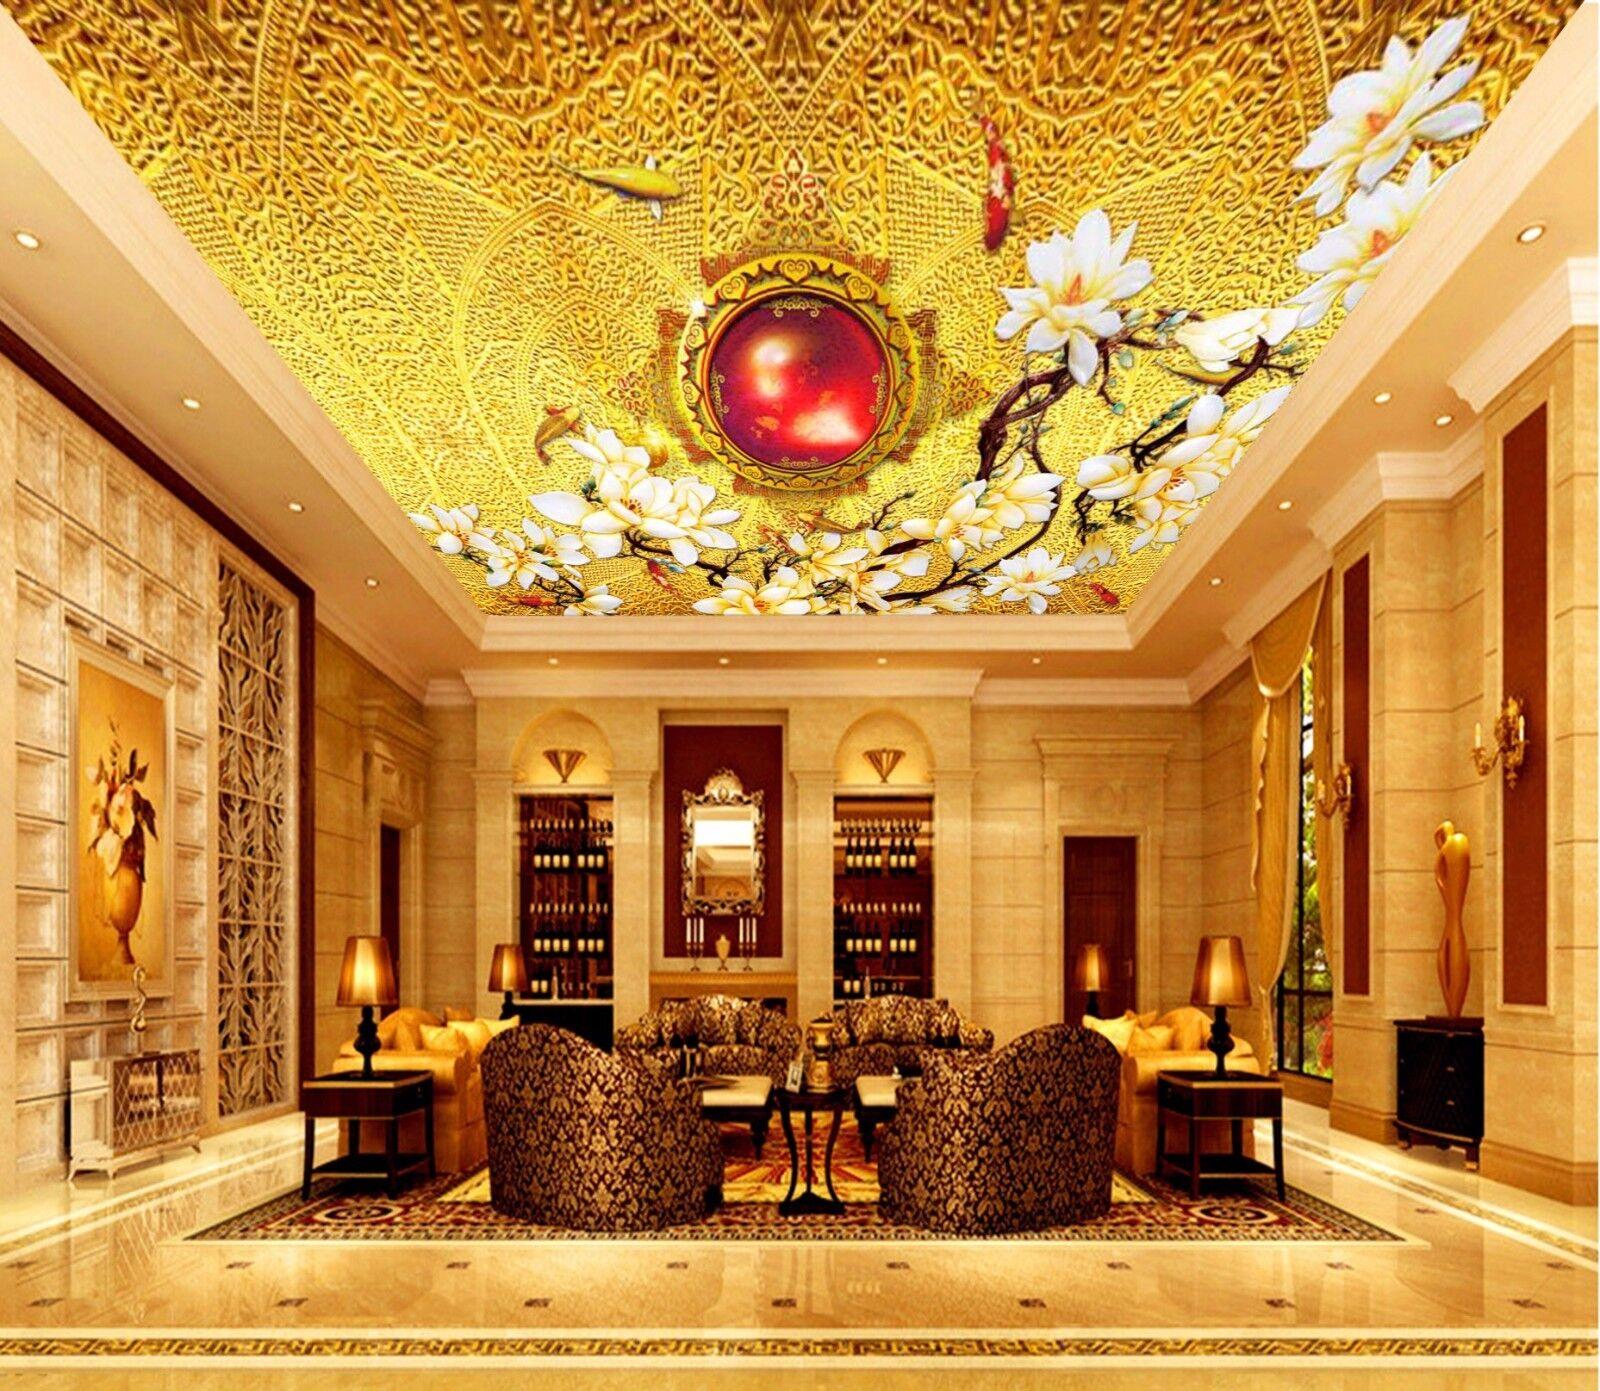 3D Gold MagnolienBlaume 53 Fototapeten Wandbild Fototapete BildTapete DE Kyra